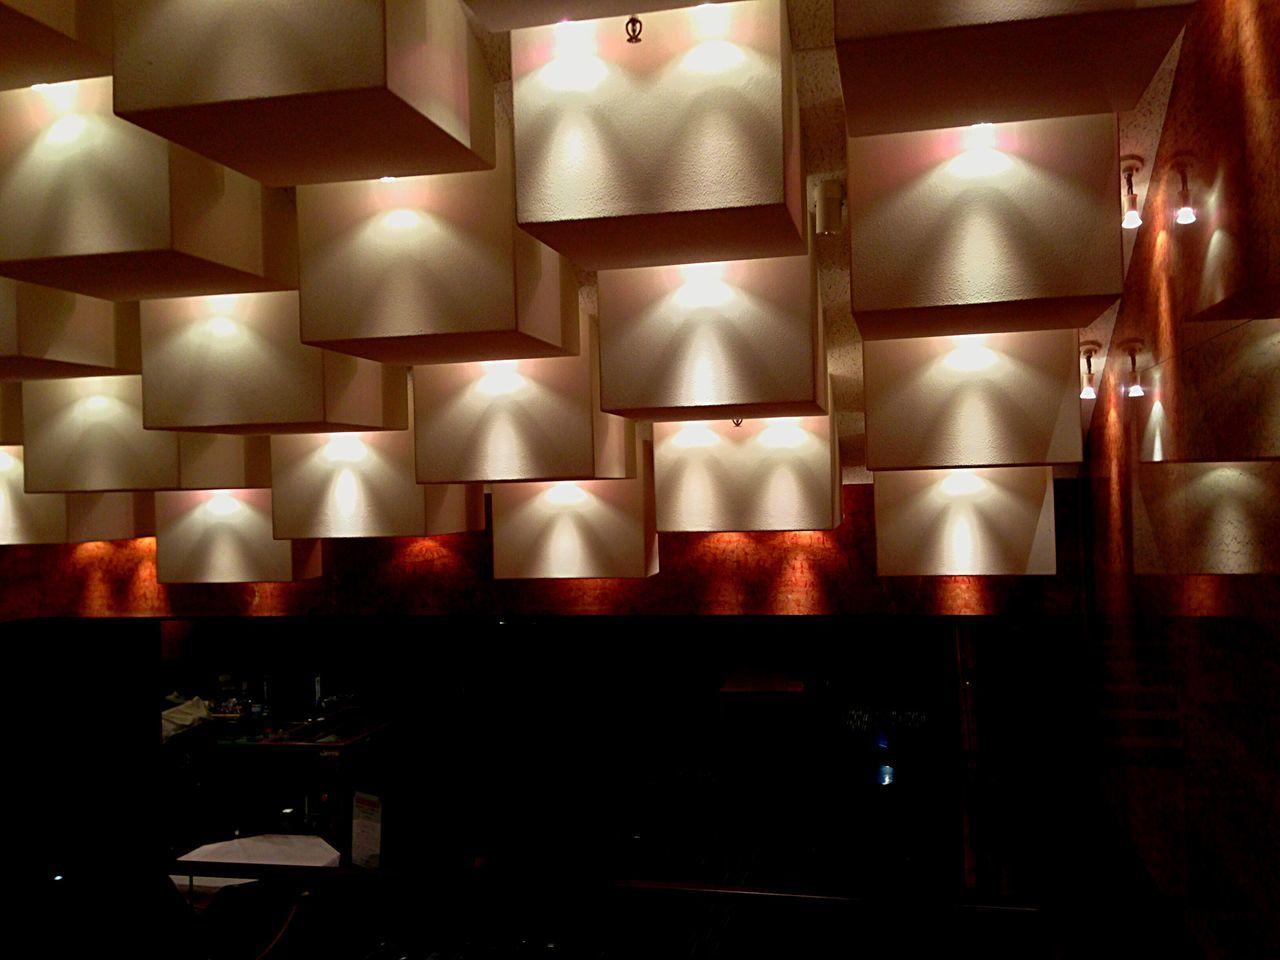 illuminated, indoors, lighting equipment, no people, night, red